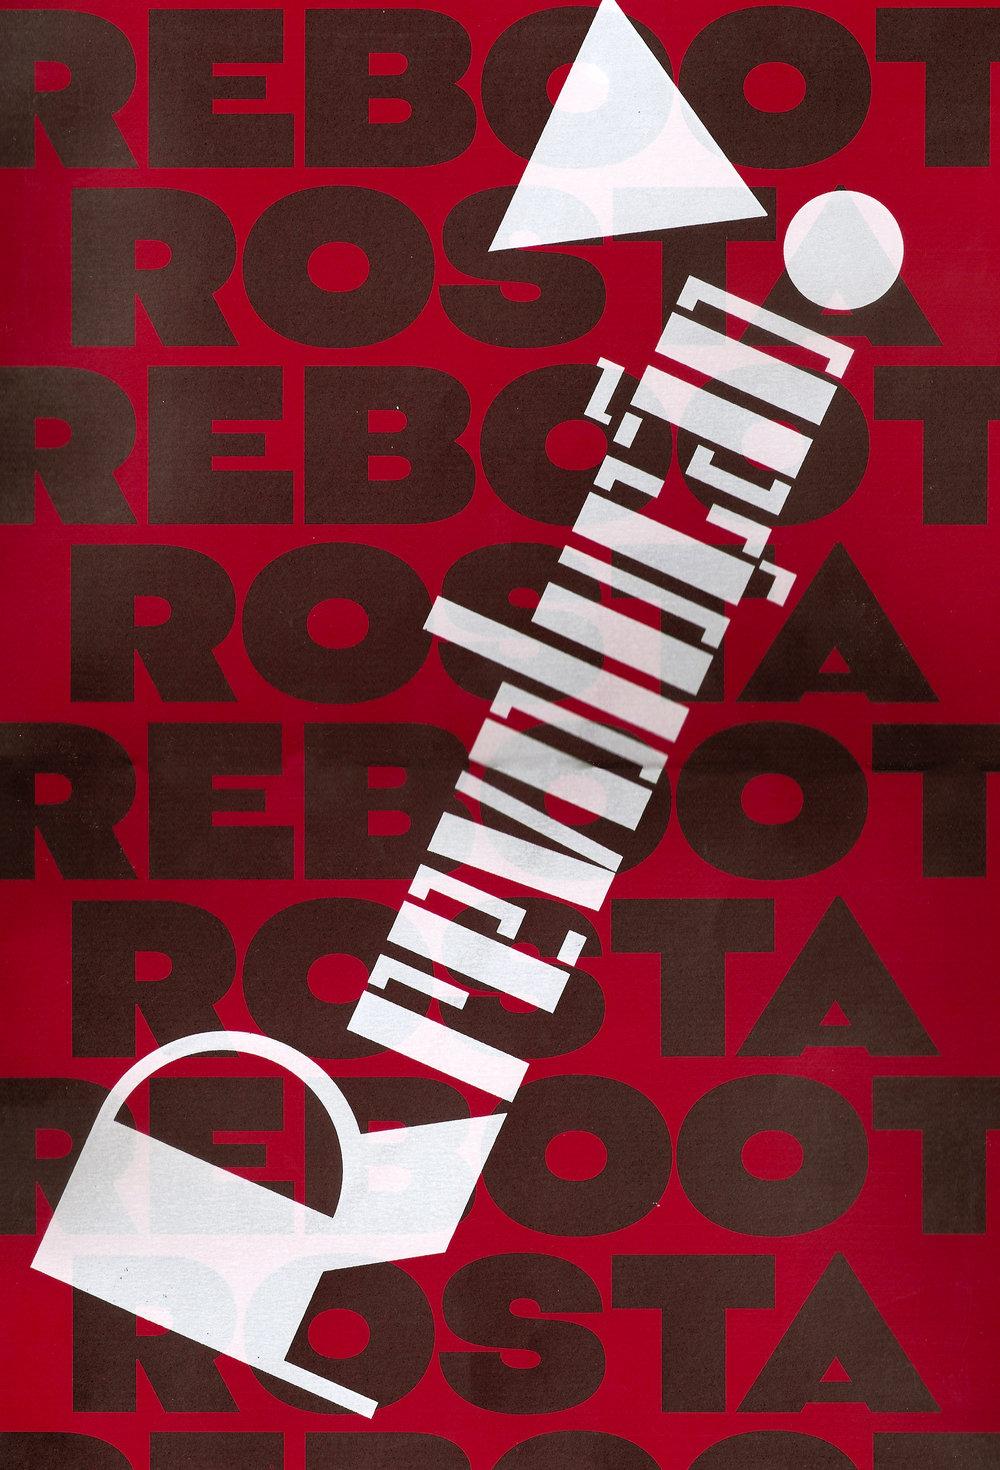 2017 - Catalog - RevoluçãoExhibition organised by António Olaio, José Maçãs de Carvalho and Pedro Pousada. Catalog Design by José Maria Cunha.Coimbra University, College of Arts, Ground Floor, 2017ISBN 978-989-99816-5-2